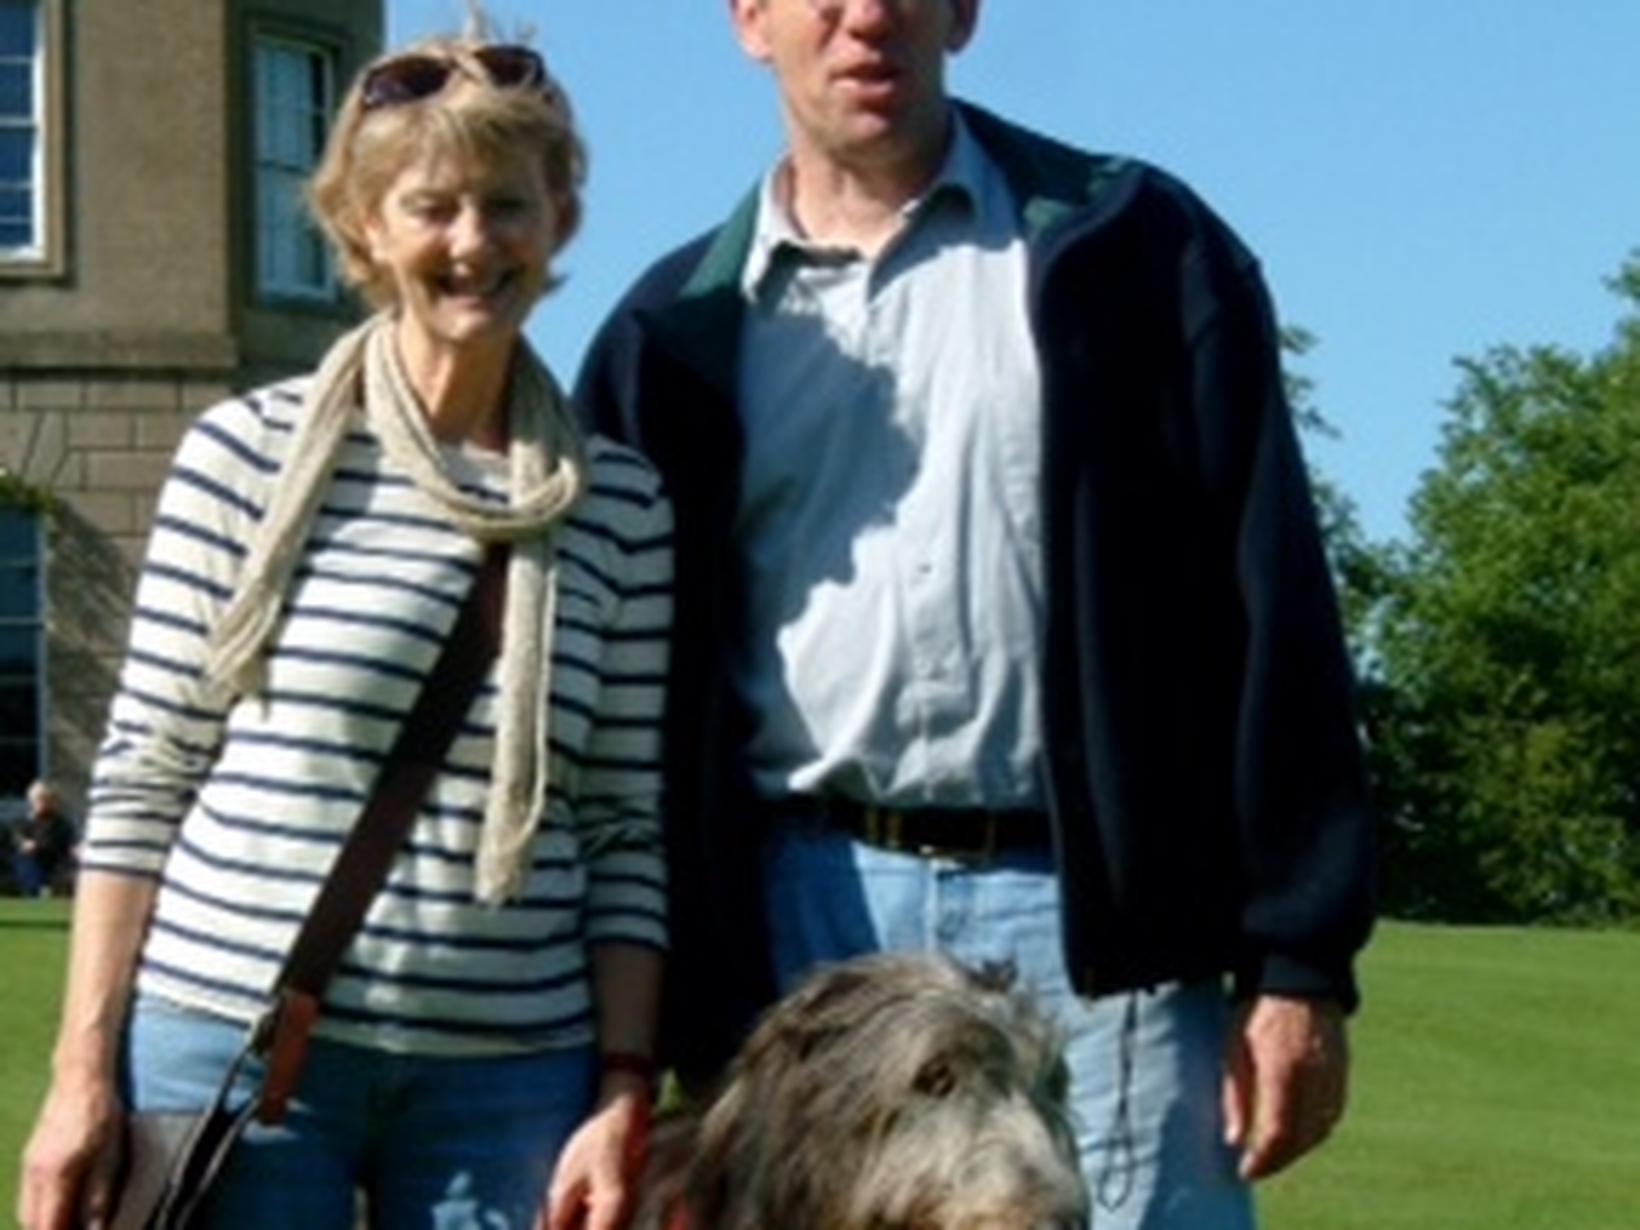 Stephen & Hilary from Bargemon, France